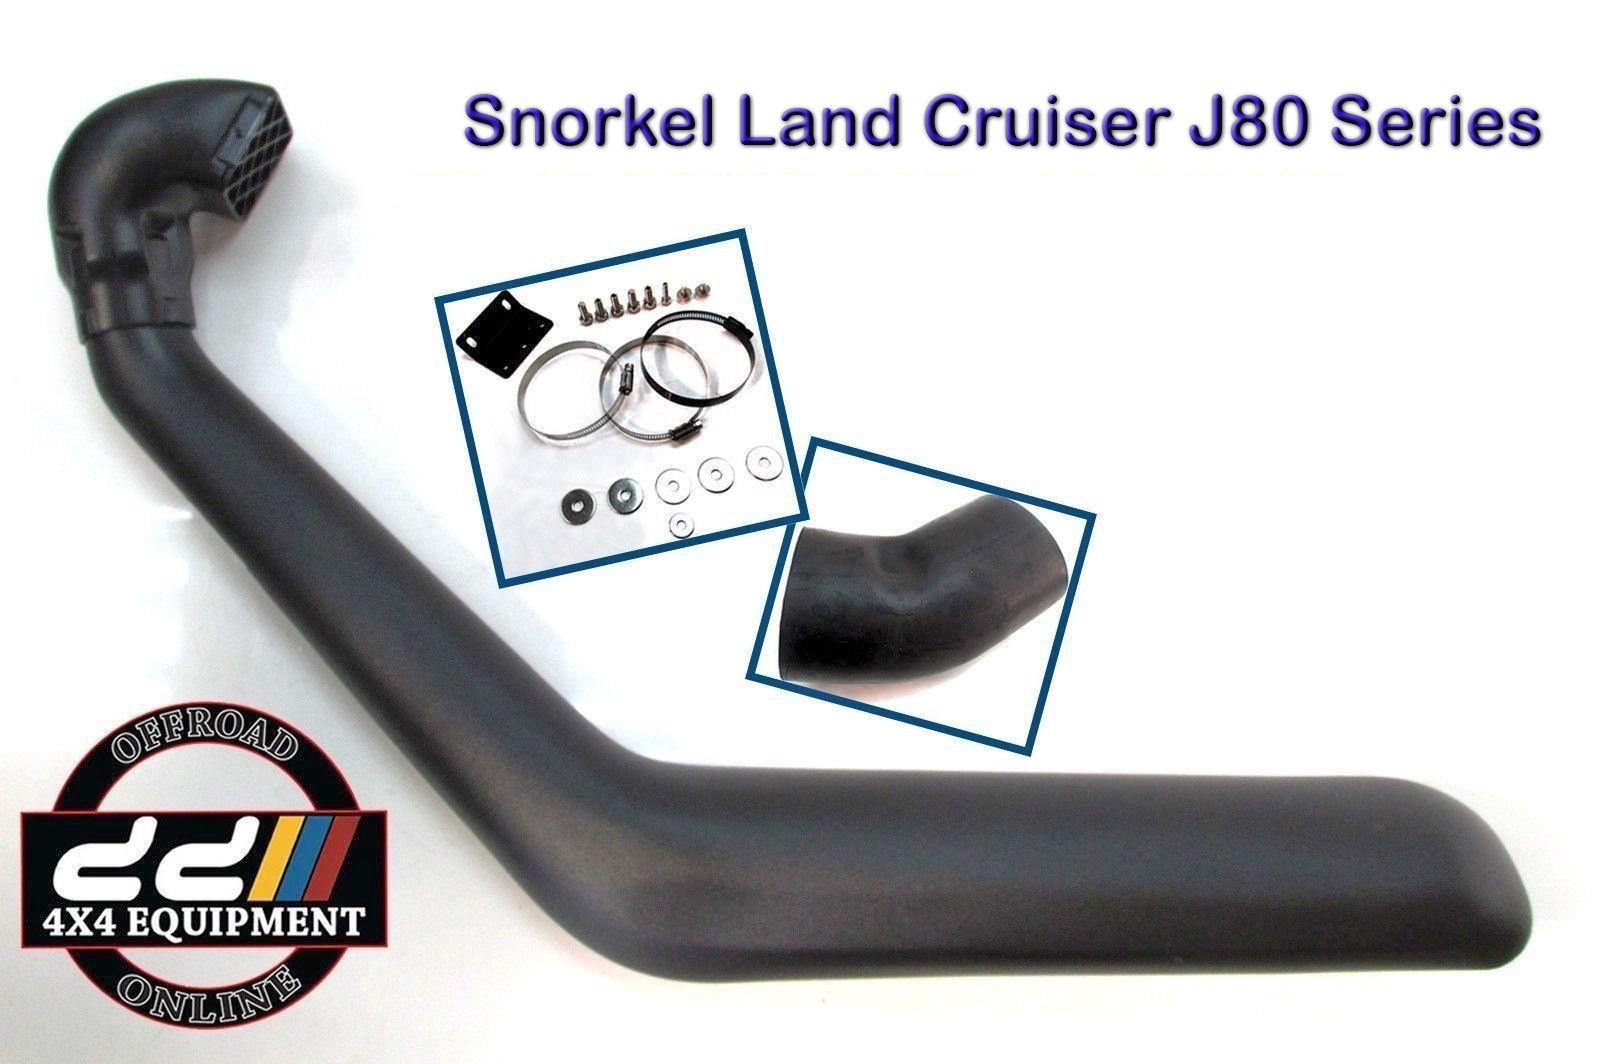 USエア インテーク シュノーケル エアインテーク4x4オフロードシュノーケルキット適合ランドクルーザーj80 fj80 hzj80 hdj80 Air intake 4x4 off road snorkel kit Fits Land Cruiser j80 fj80 hzj80 hdj80